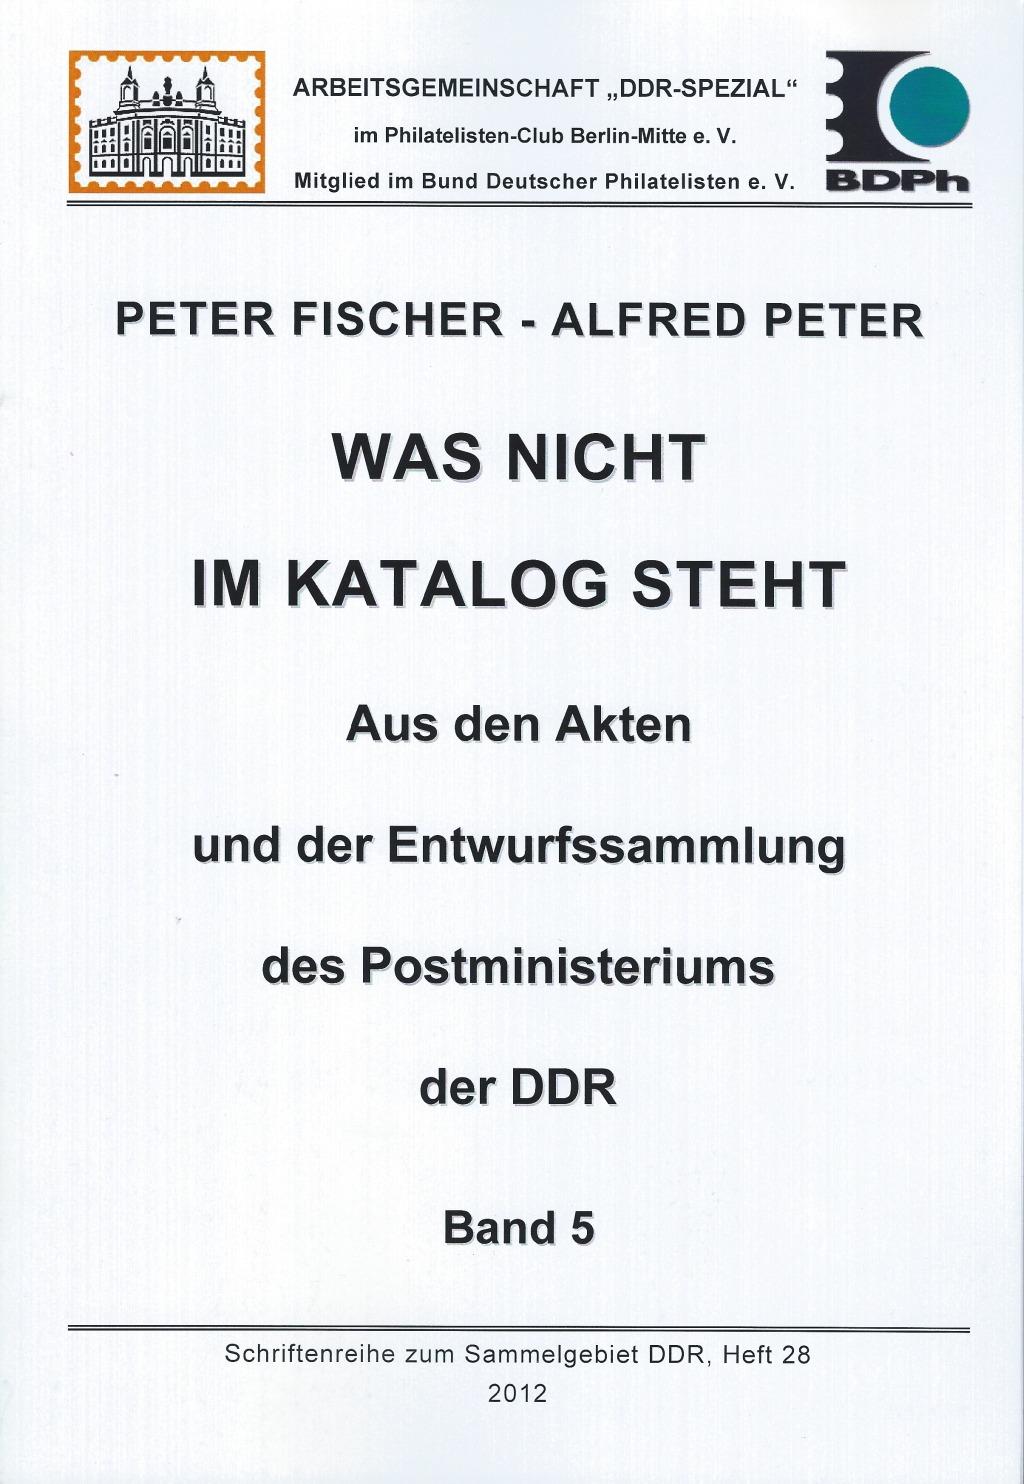 DDR Philatelie Literatur Akten Postministerium